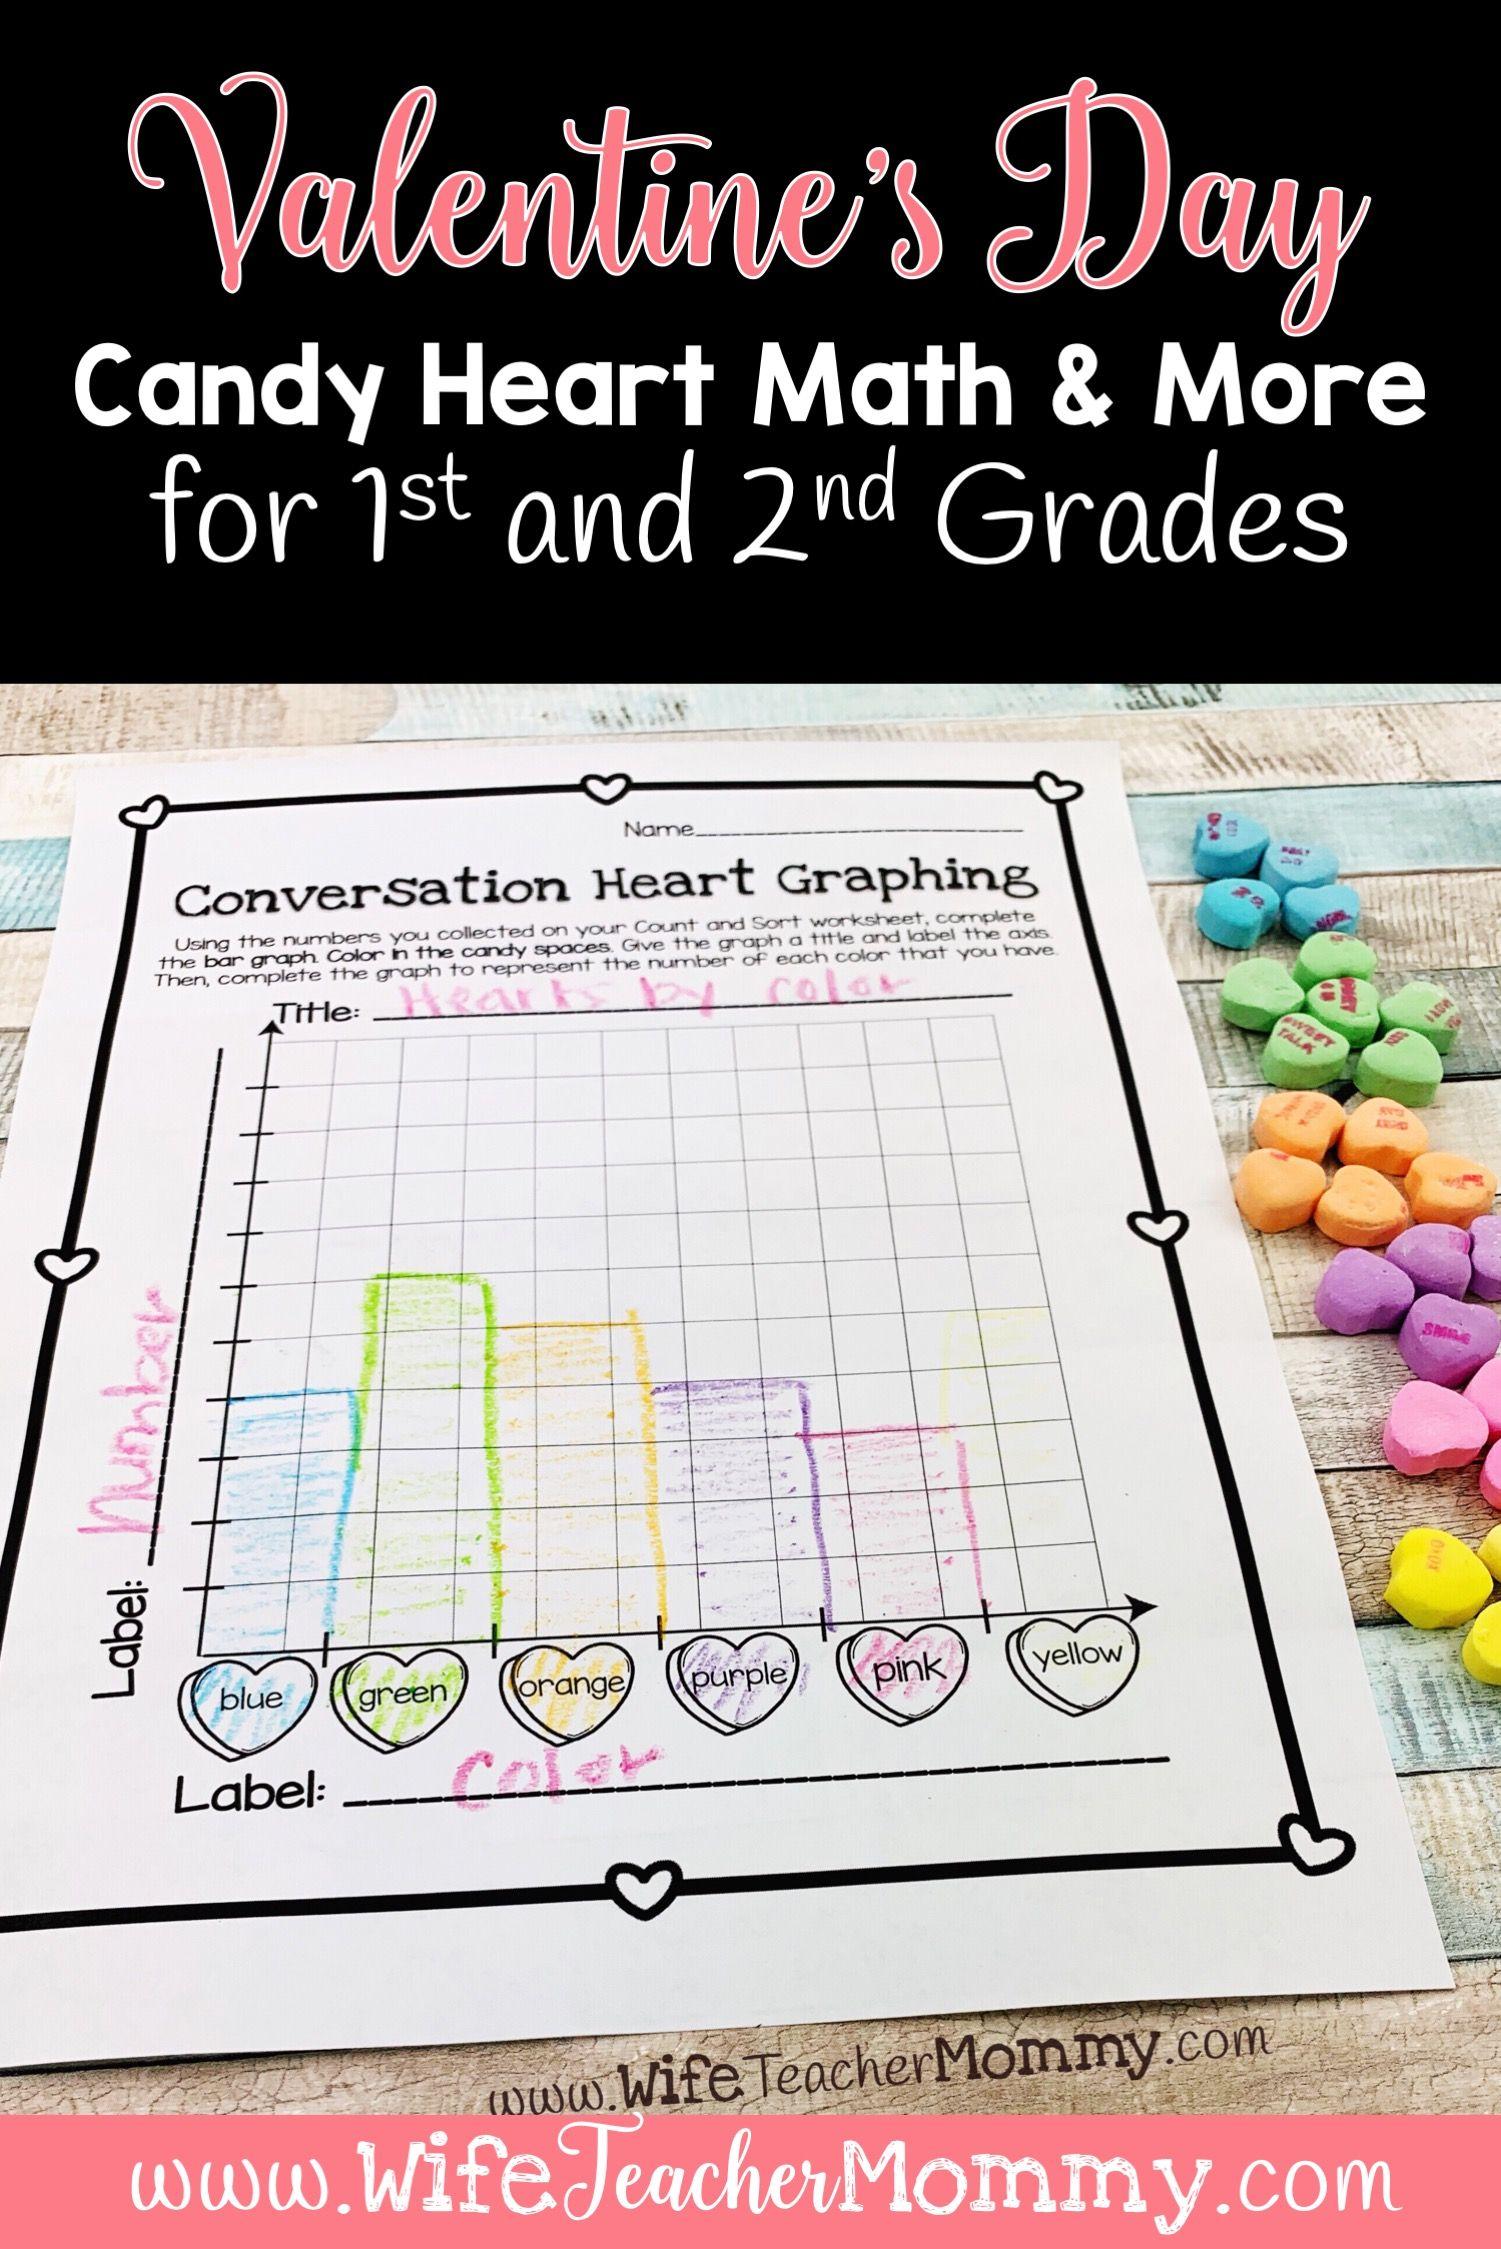 Conversation Heart Math Activities For Kindergarten And